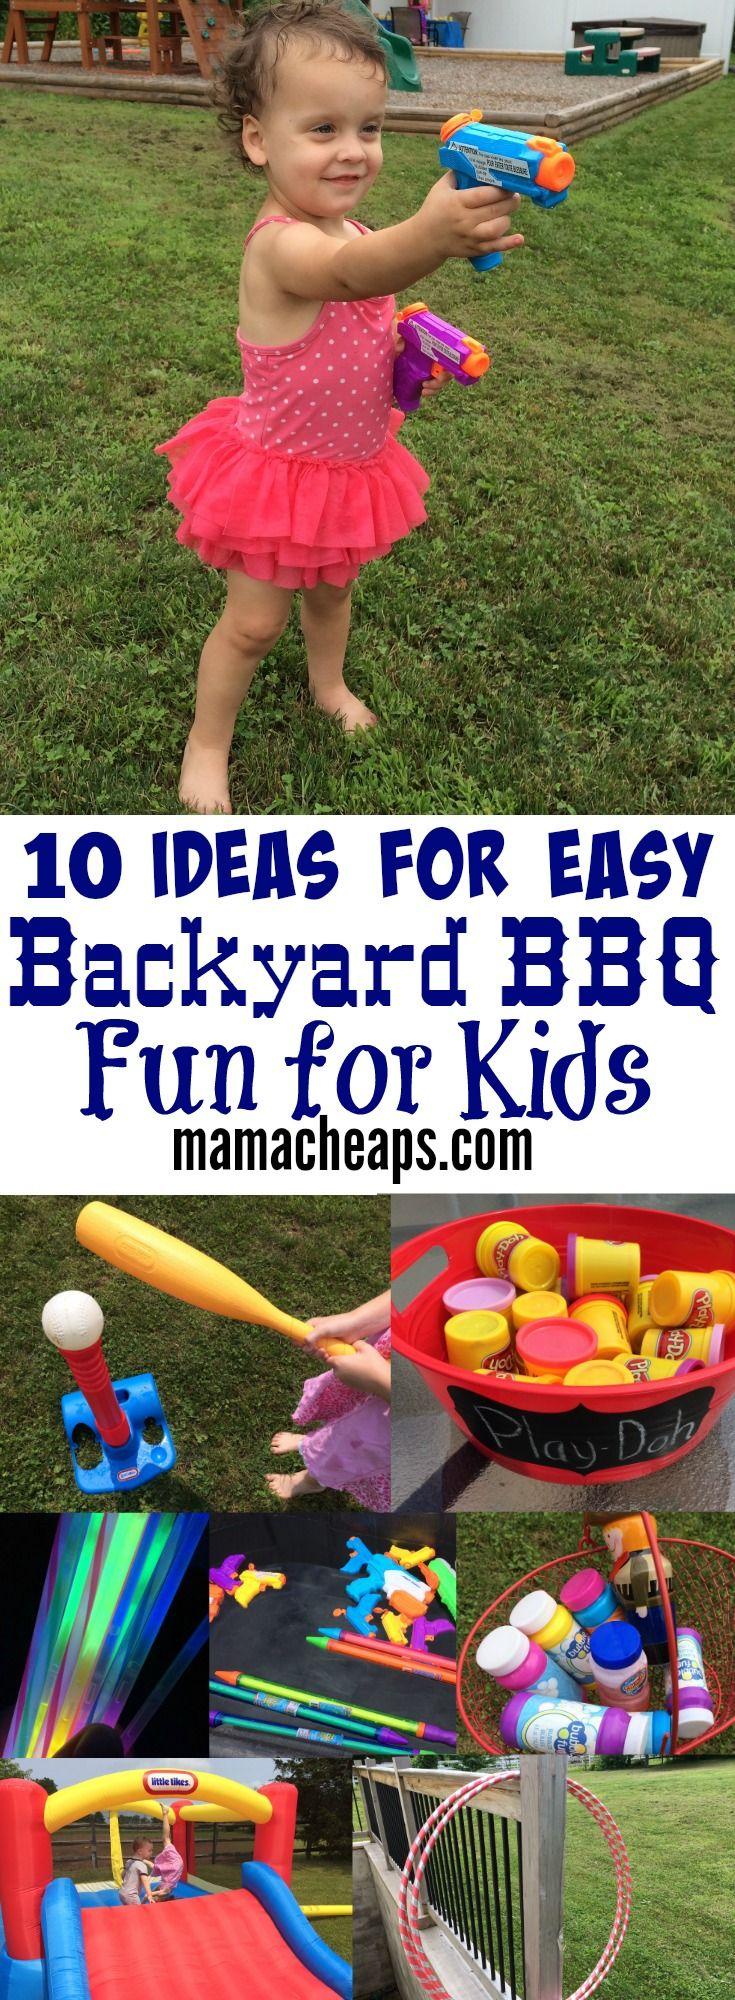 Easy Backyard Games